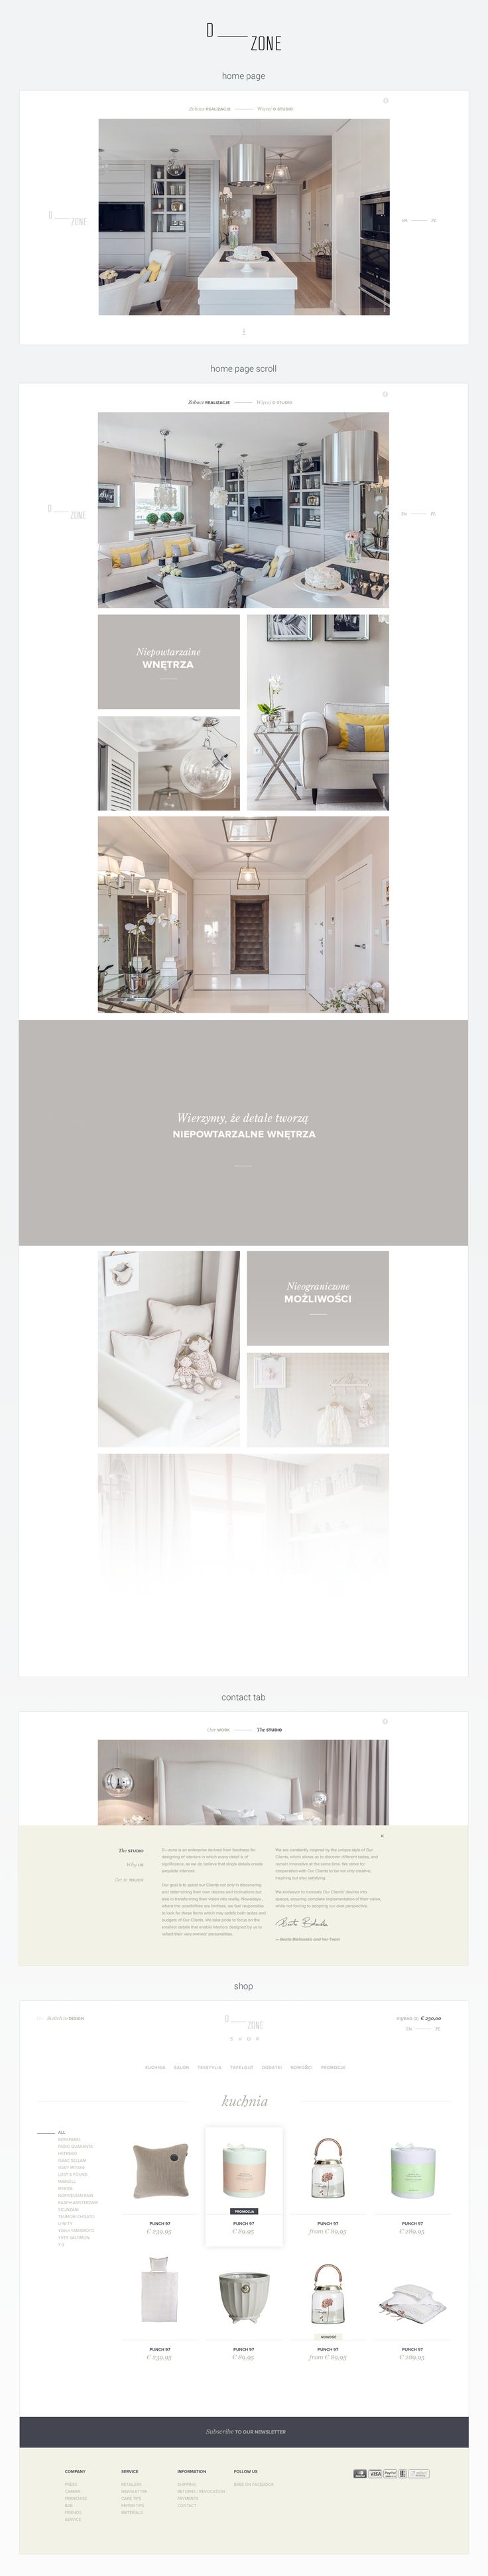 D_Zone - Interior designer website + shop